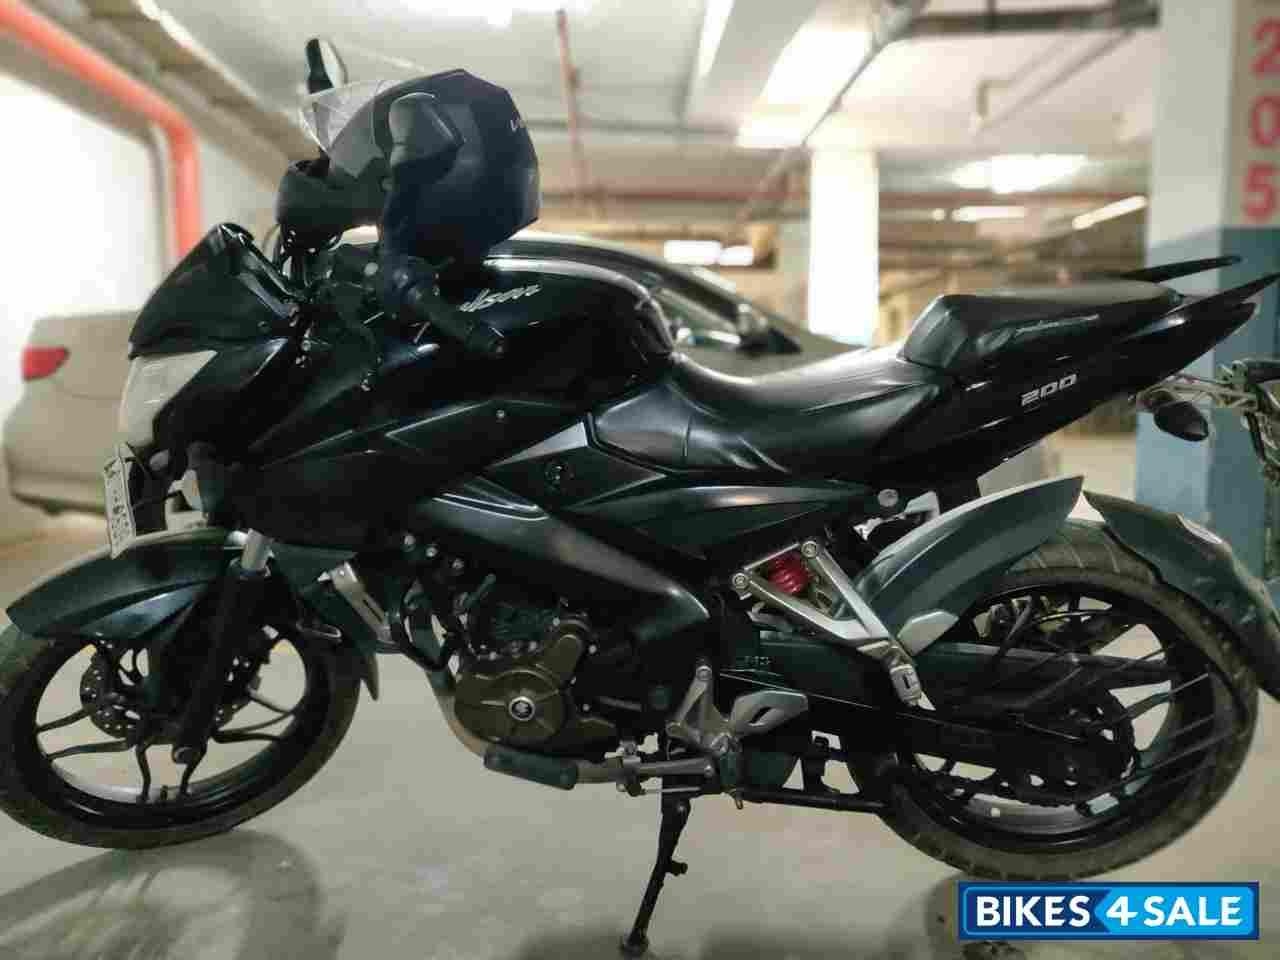 Bajaj Pulsar 200 NS price 96,000 Rs, specifications